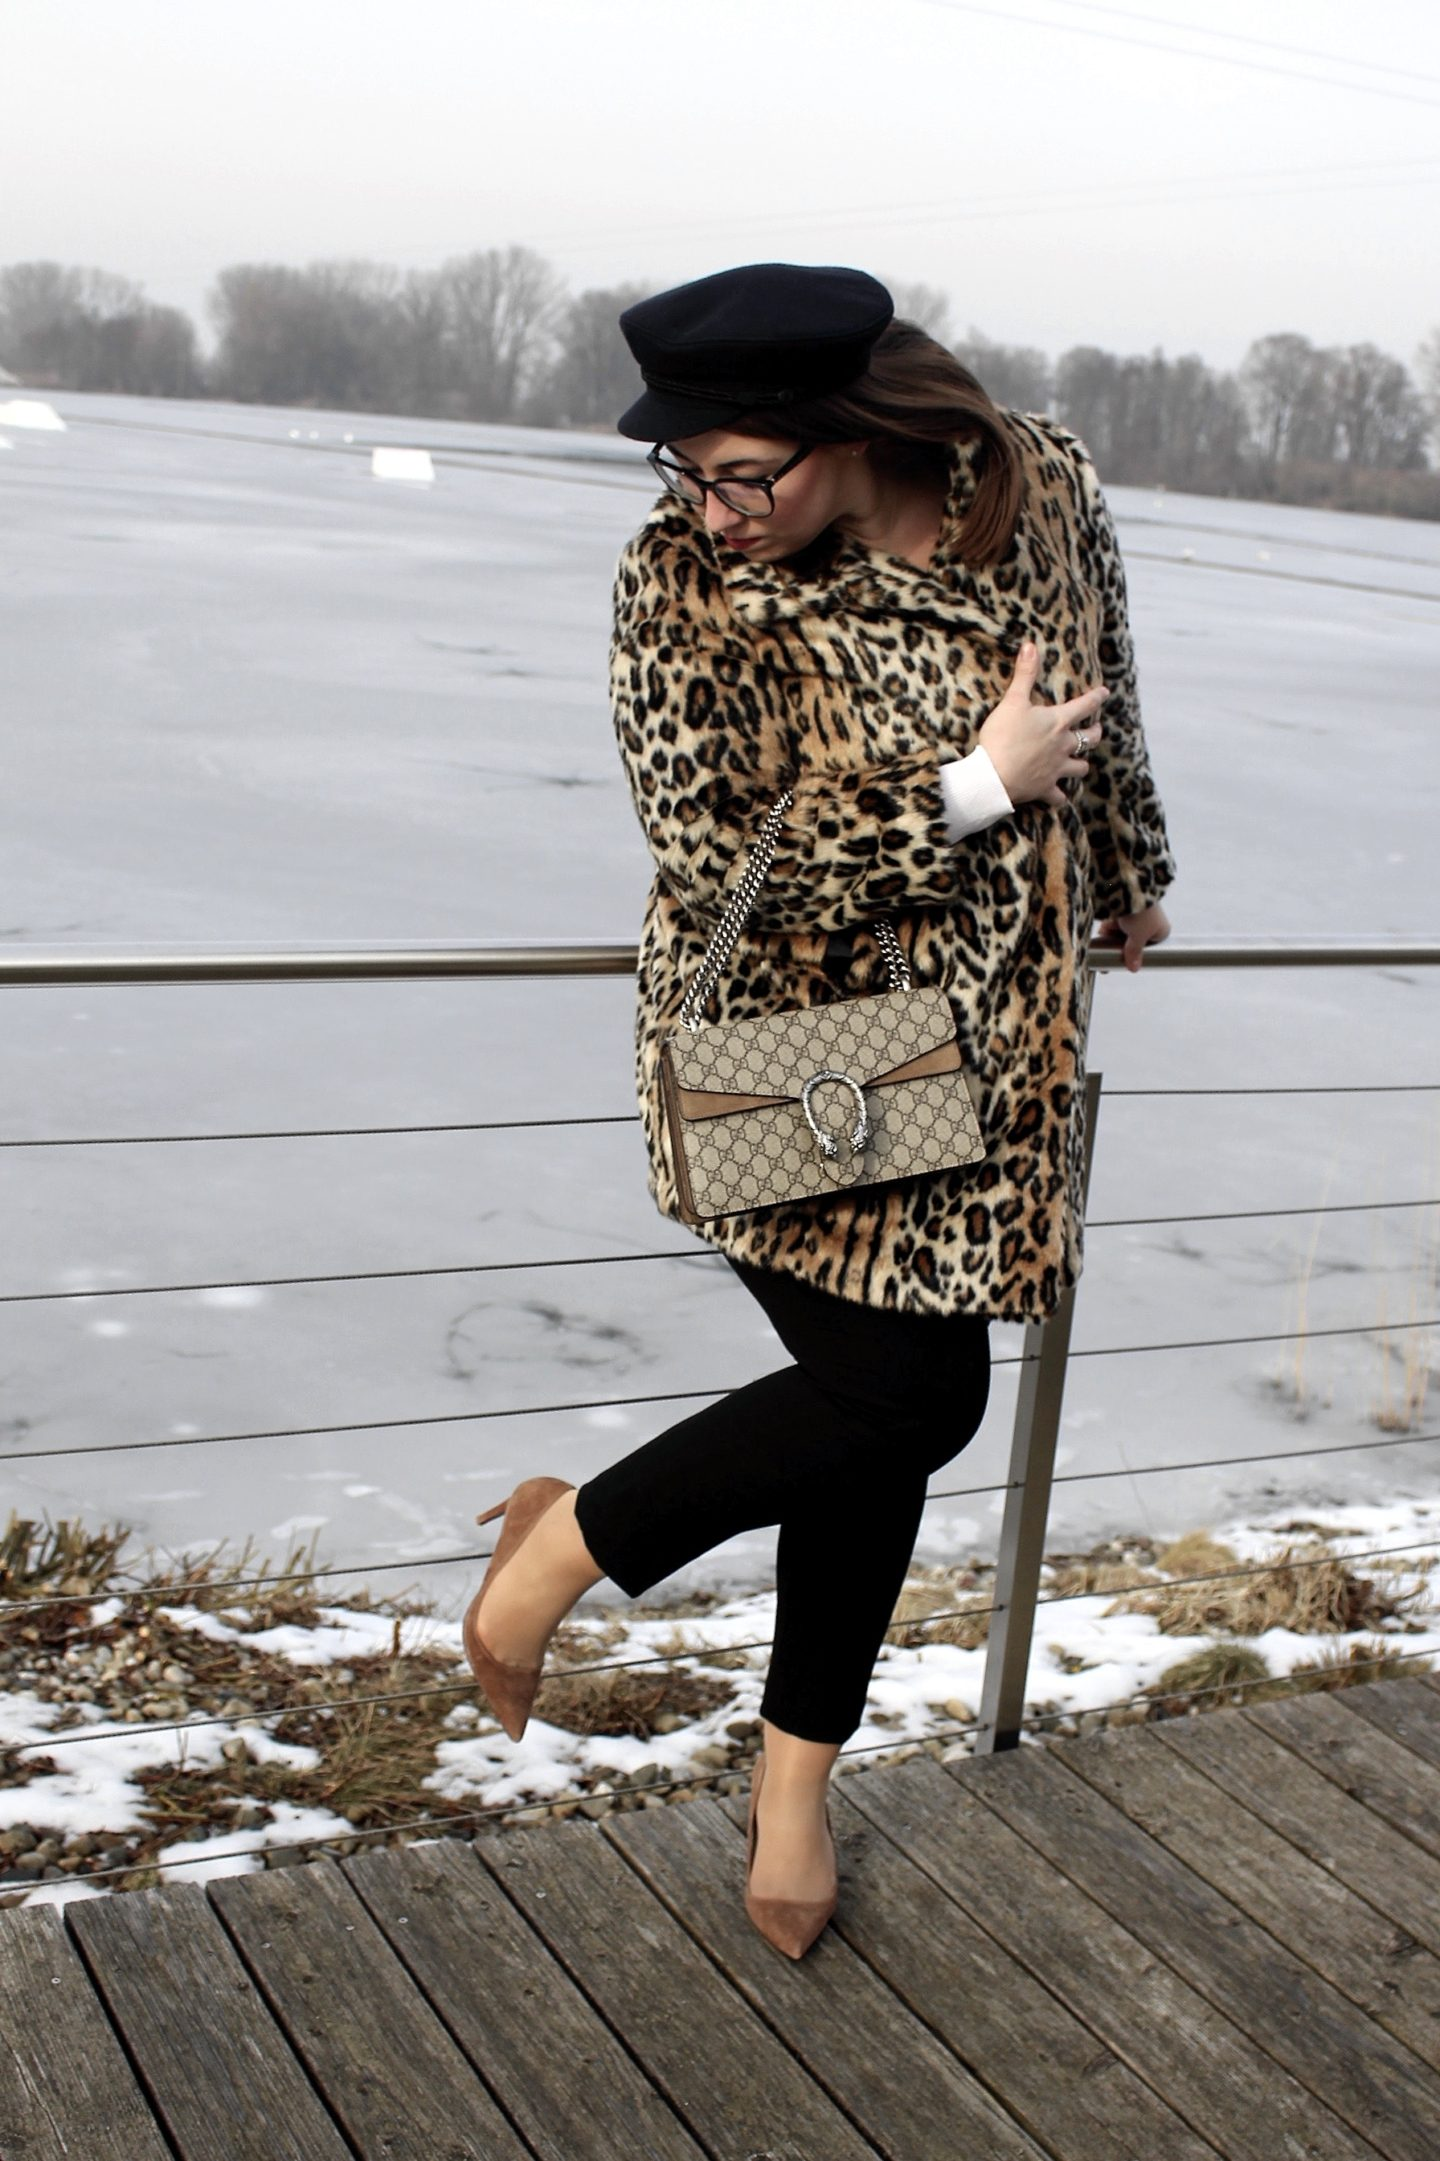 outfit-kombinieren-leo-mantel-fake-fur-mantel-animal-print-elbsegler-mütze-gucci-dionysus-céline-brille-slacks-business-outfit-munichblogger-fashionblogger-blogger-münchen-curvyblogger-misssuzieloves-heidebach-hm-leomantel